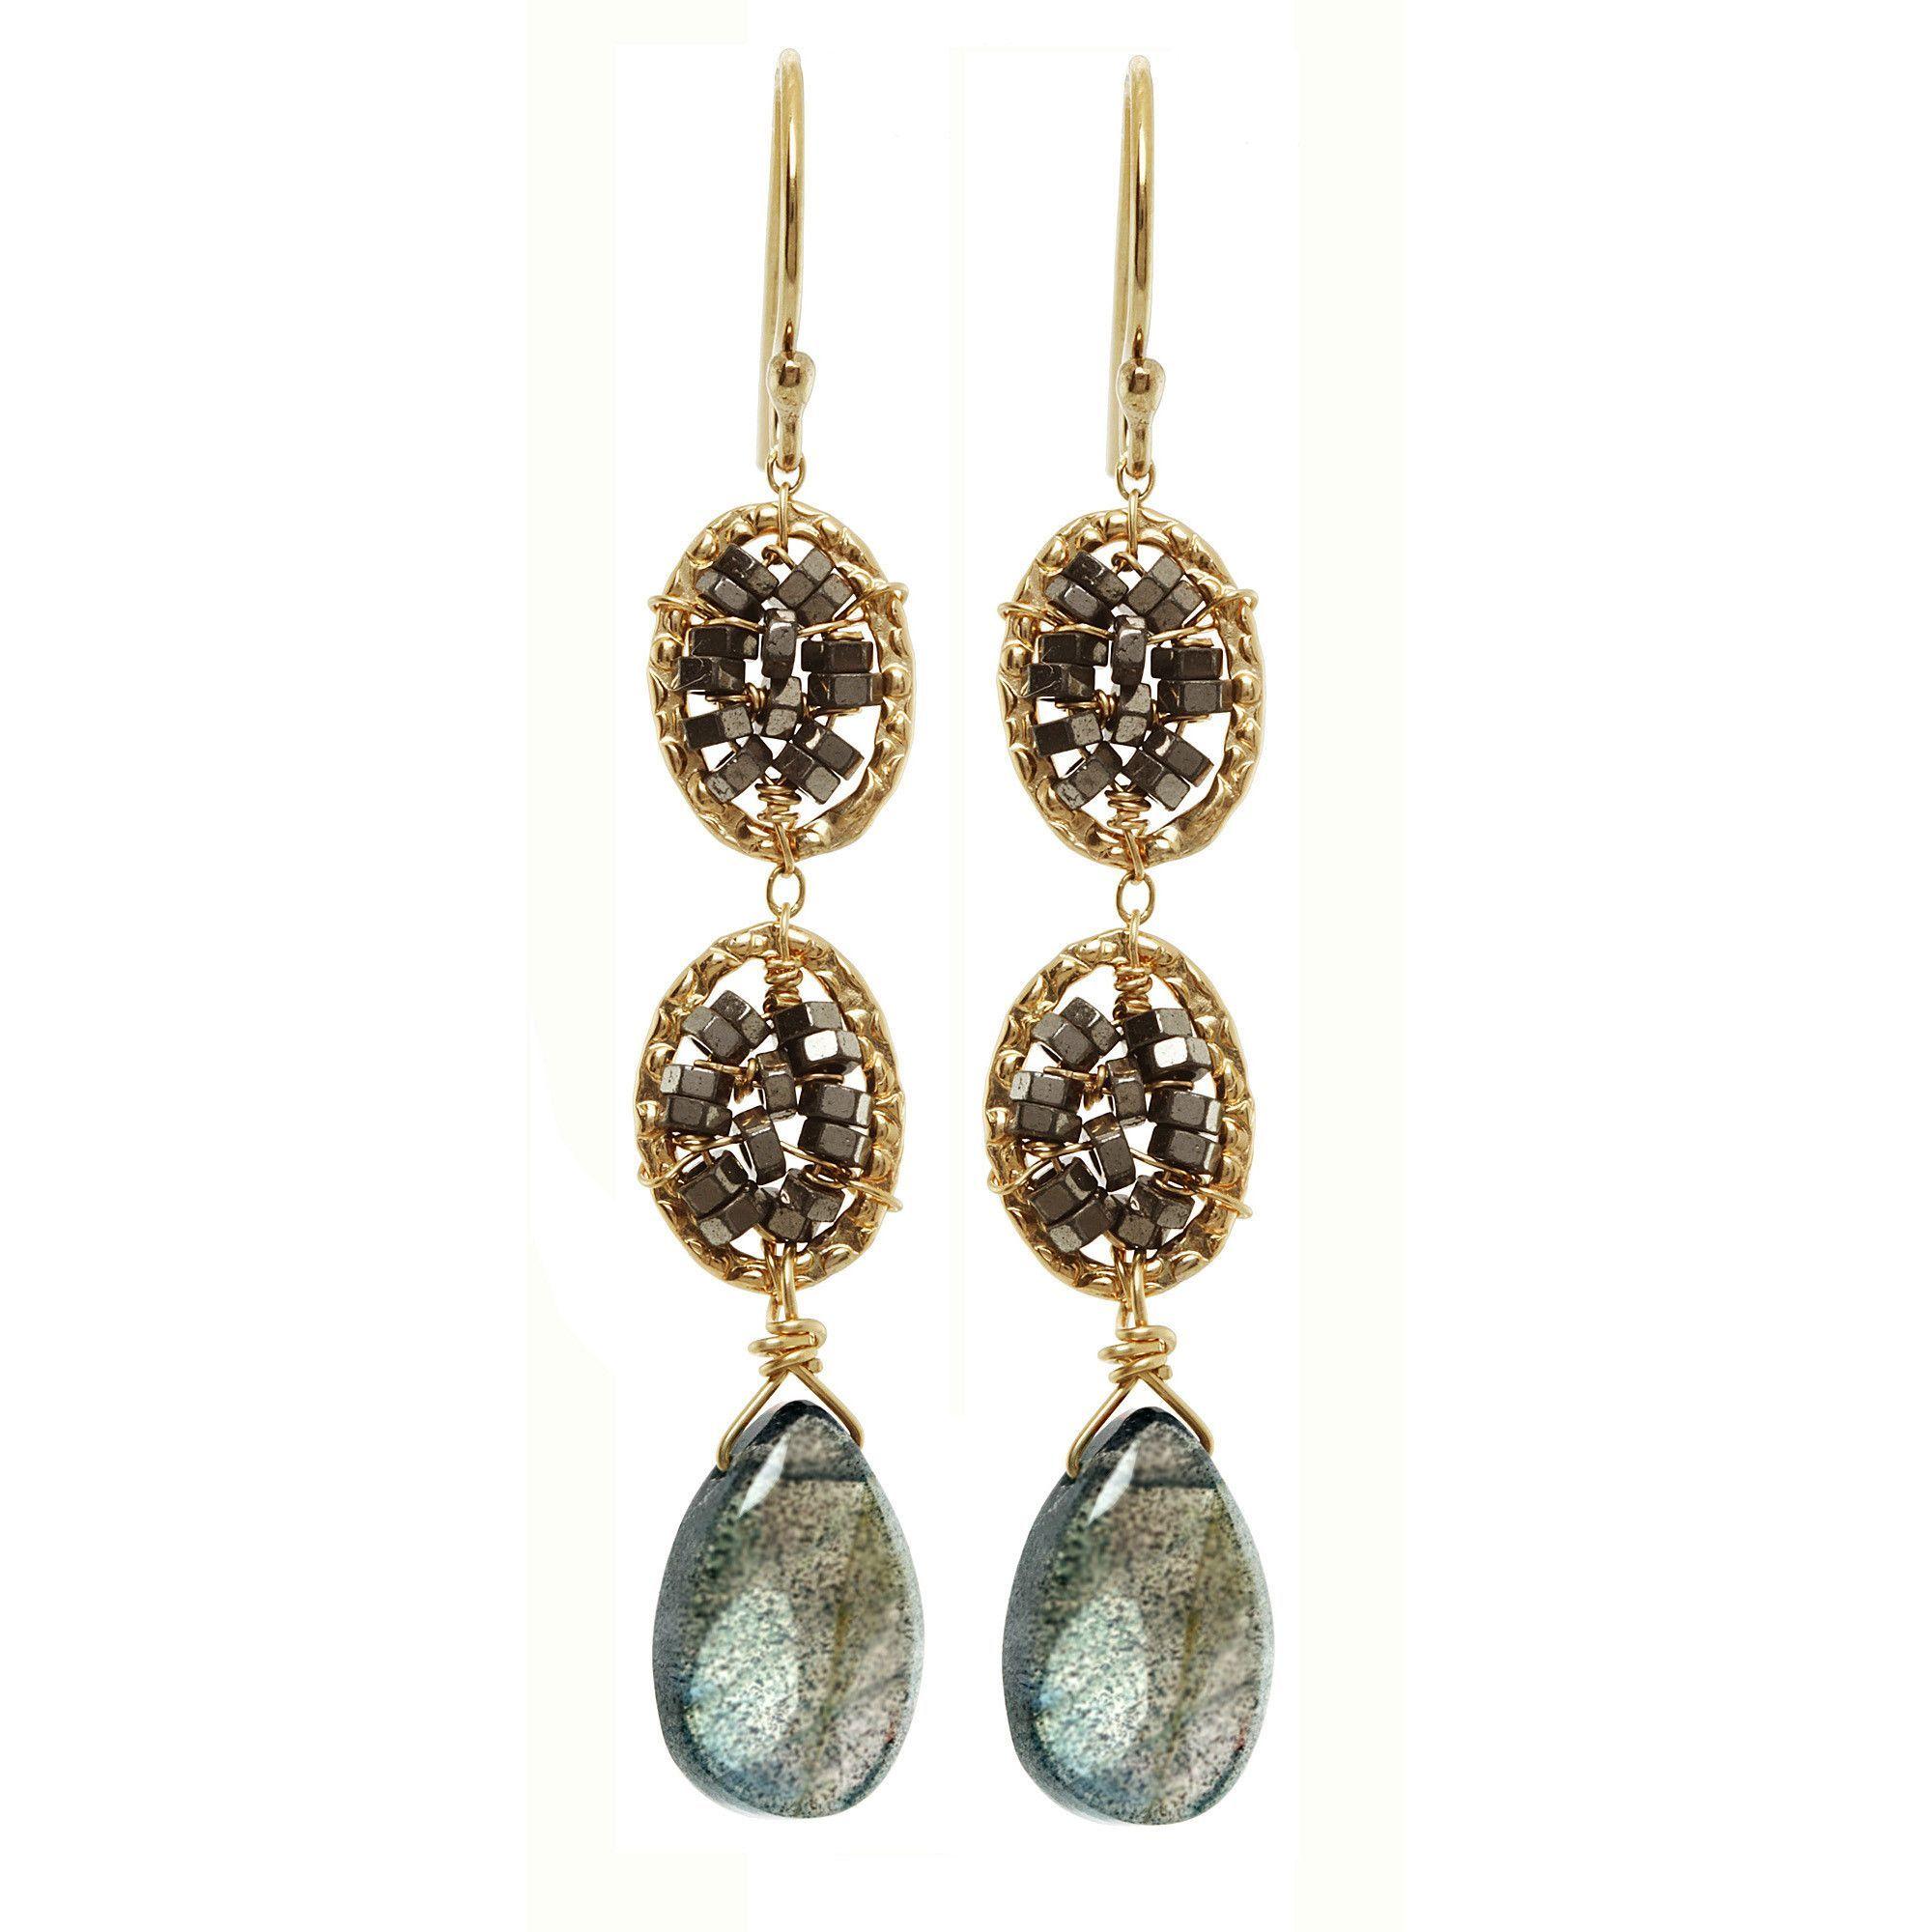 Hematite and Labradorite Earrings 3025 by Michelle Pressler